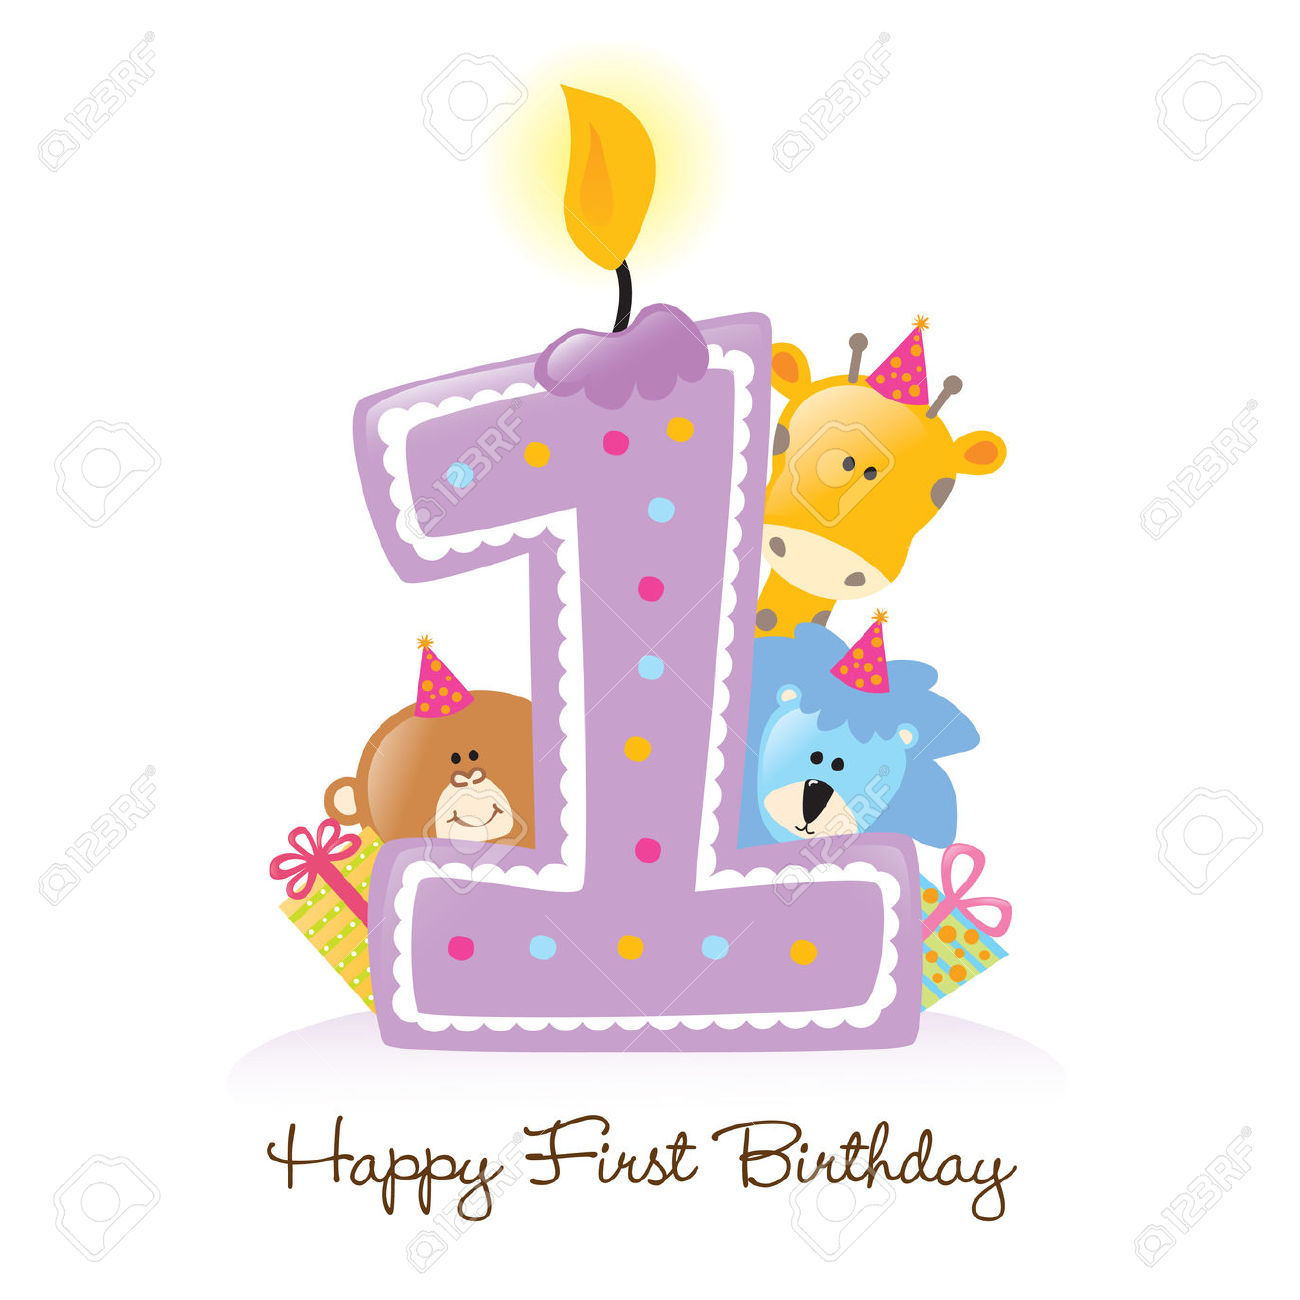 1st Birthday Princess Clip Art. Resoluti-1st Birthday Princess Clip Art. Resolution 1300x1300 .-2